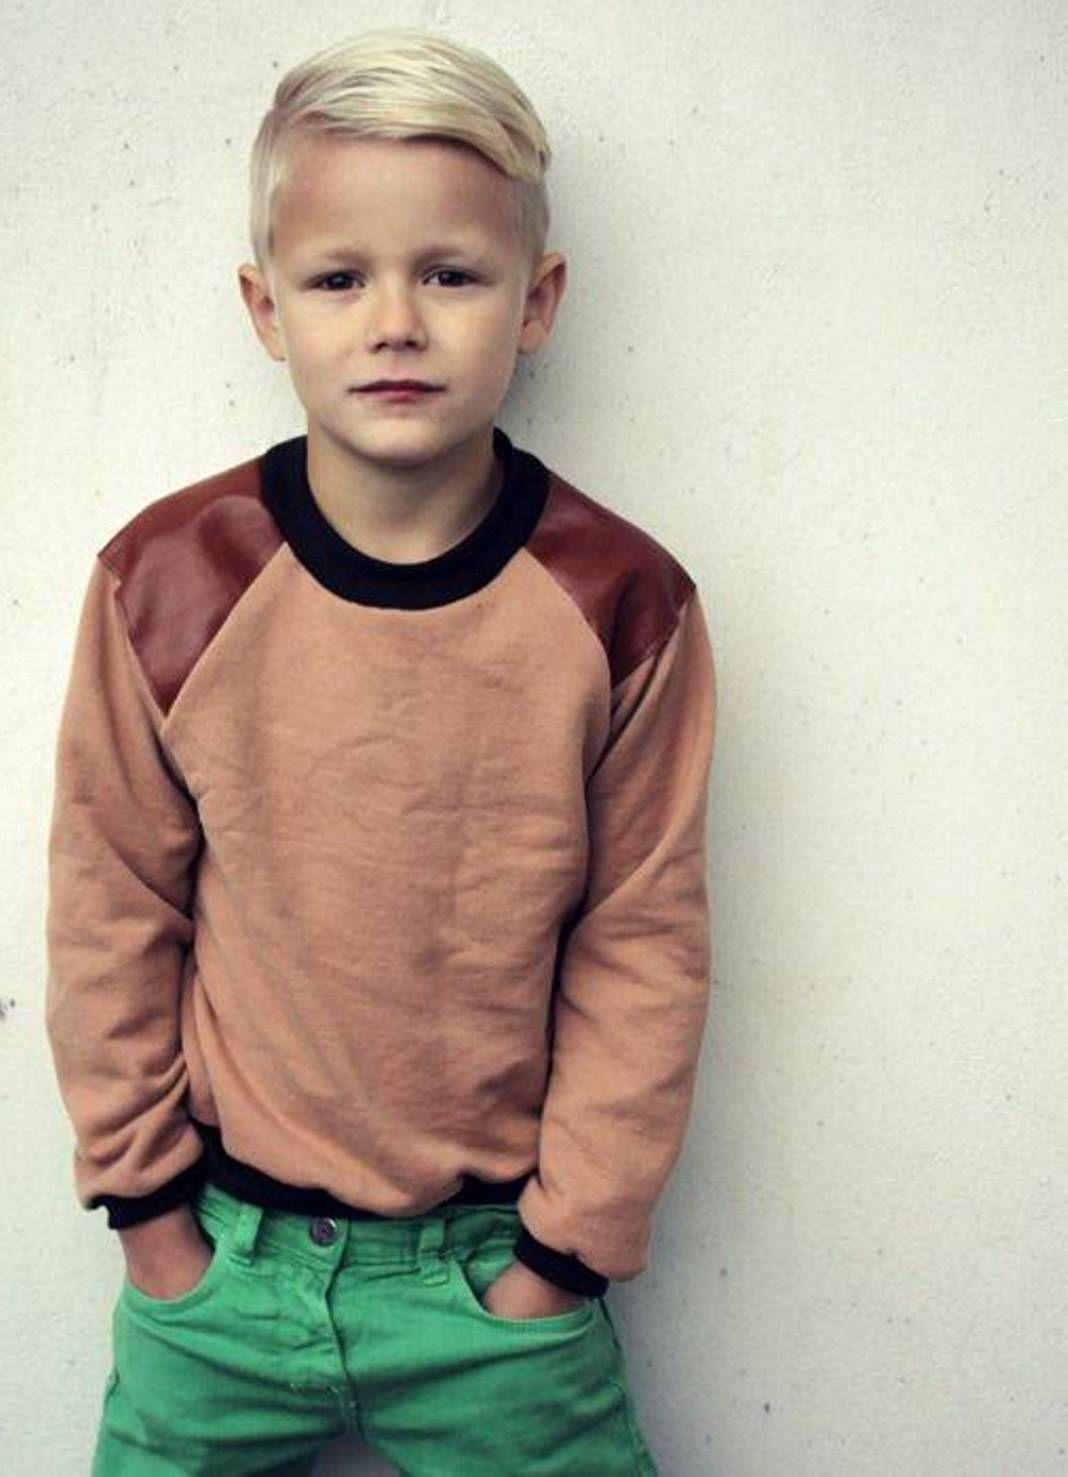 Swag Short Hair Styles For Boys Little Boy HAIRSTYLES FOR GUYS - How to cut boys hair